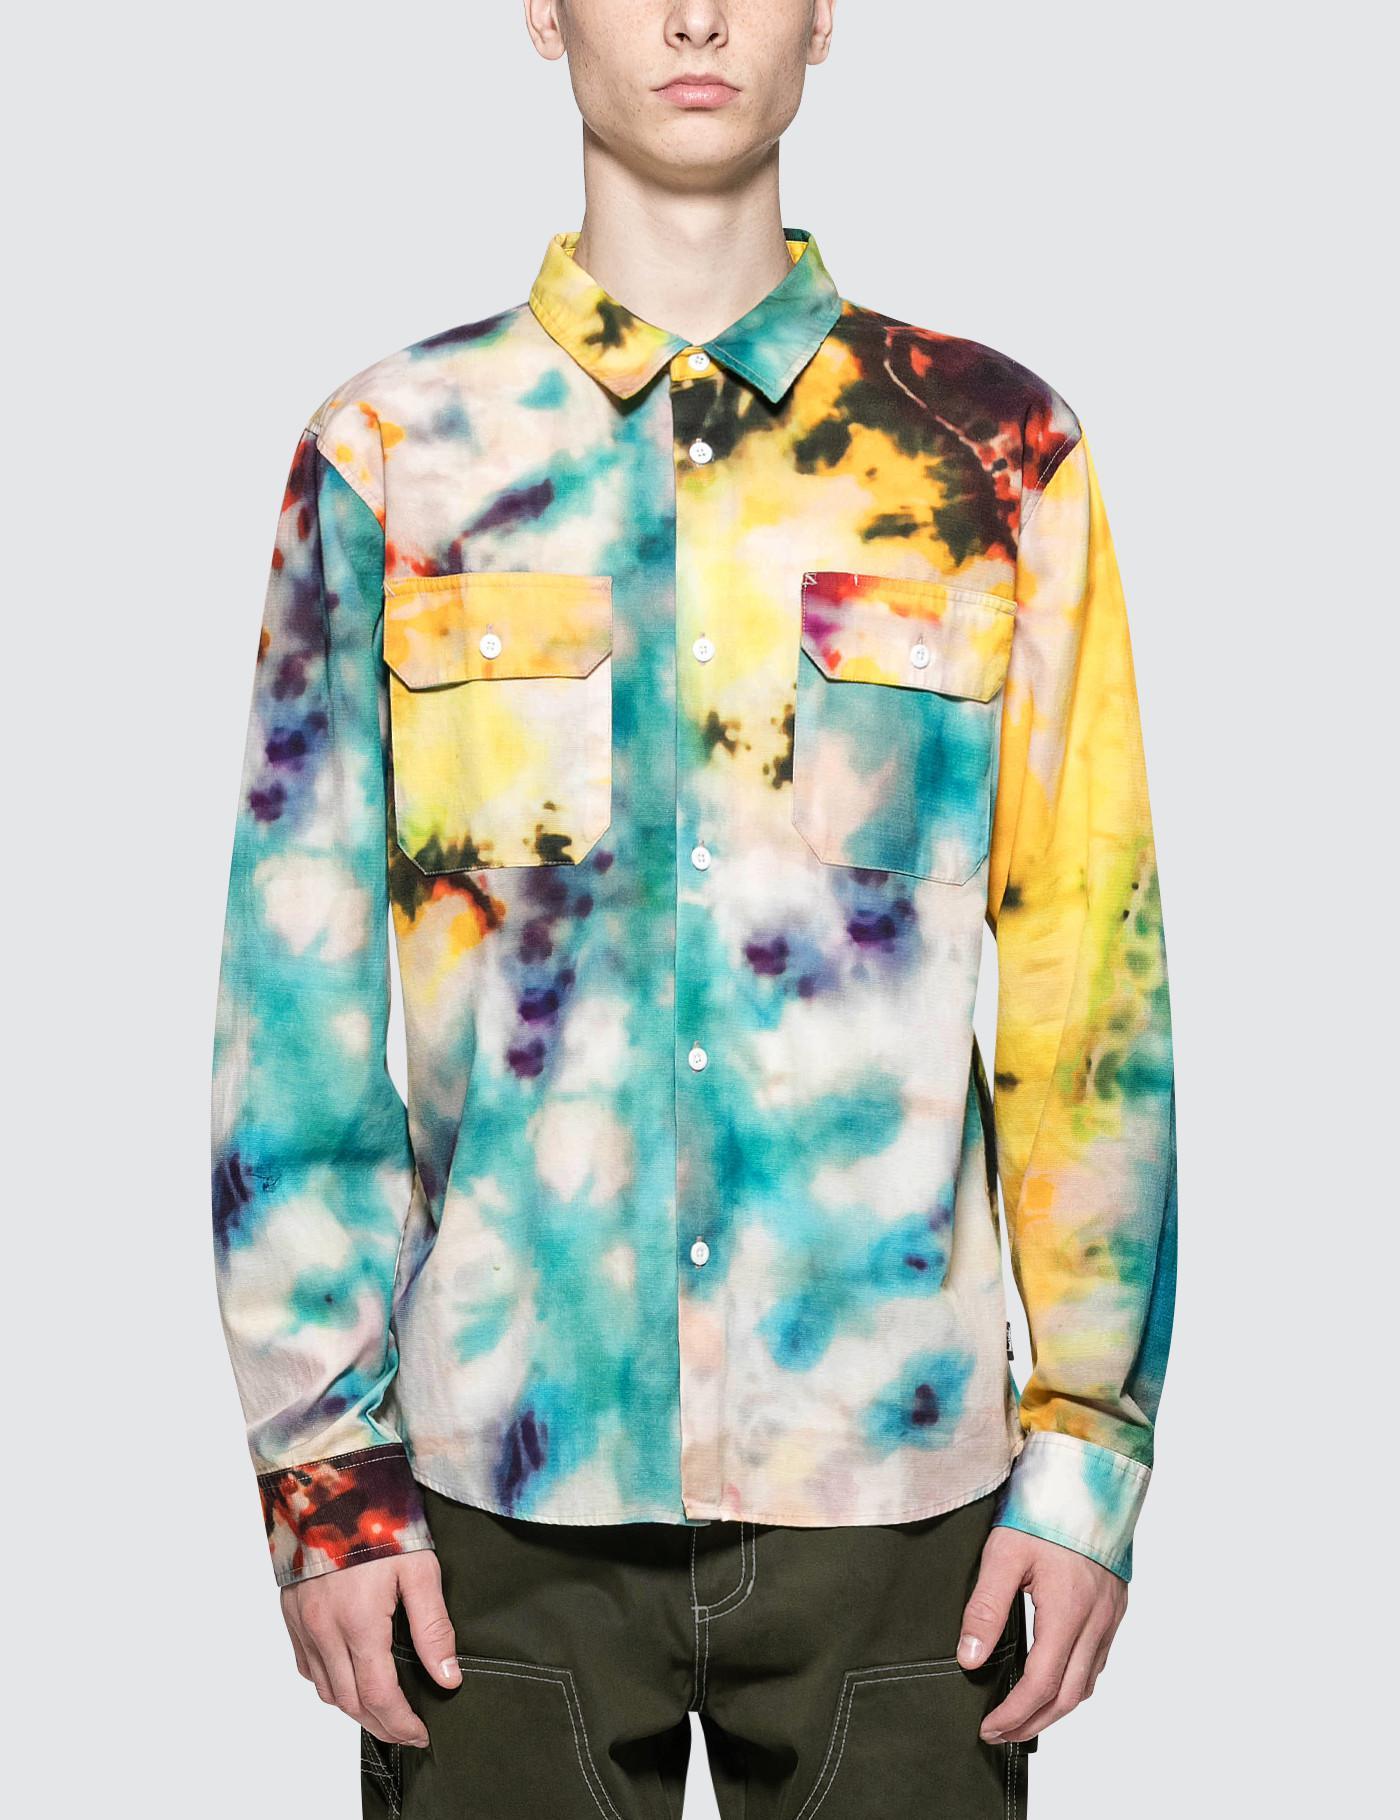 94ddfb6bd2d Stussy Tie Dye Work L s Shirt in Yellow for Men - Lyst